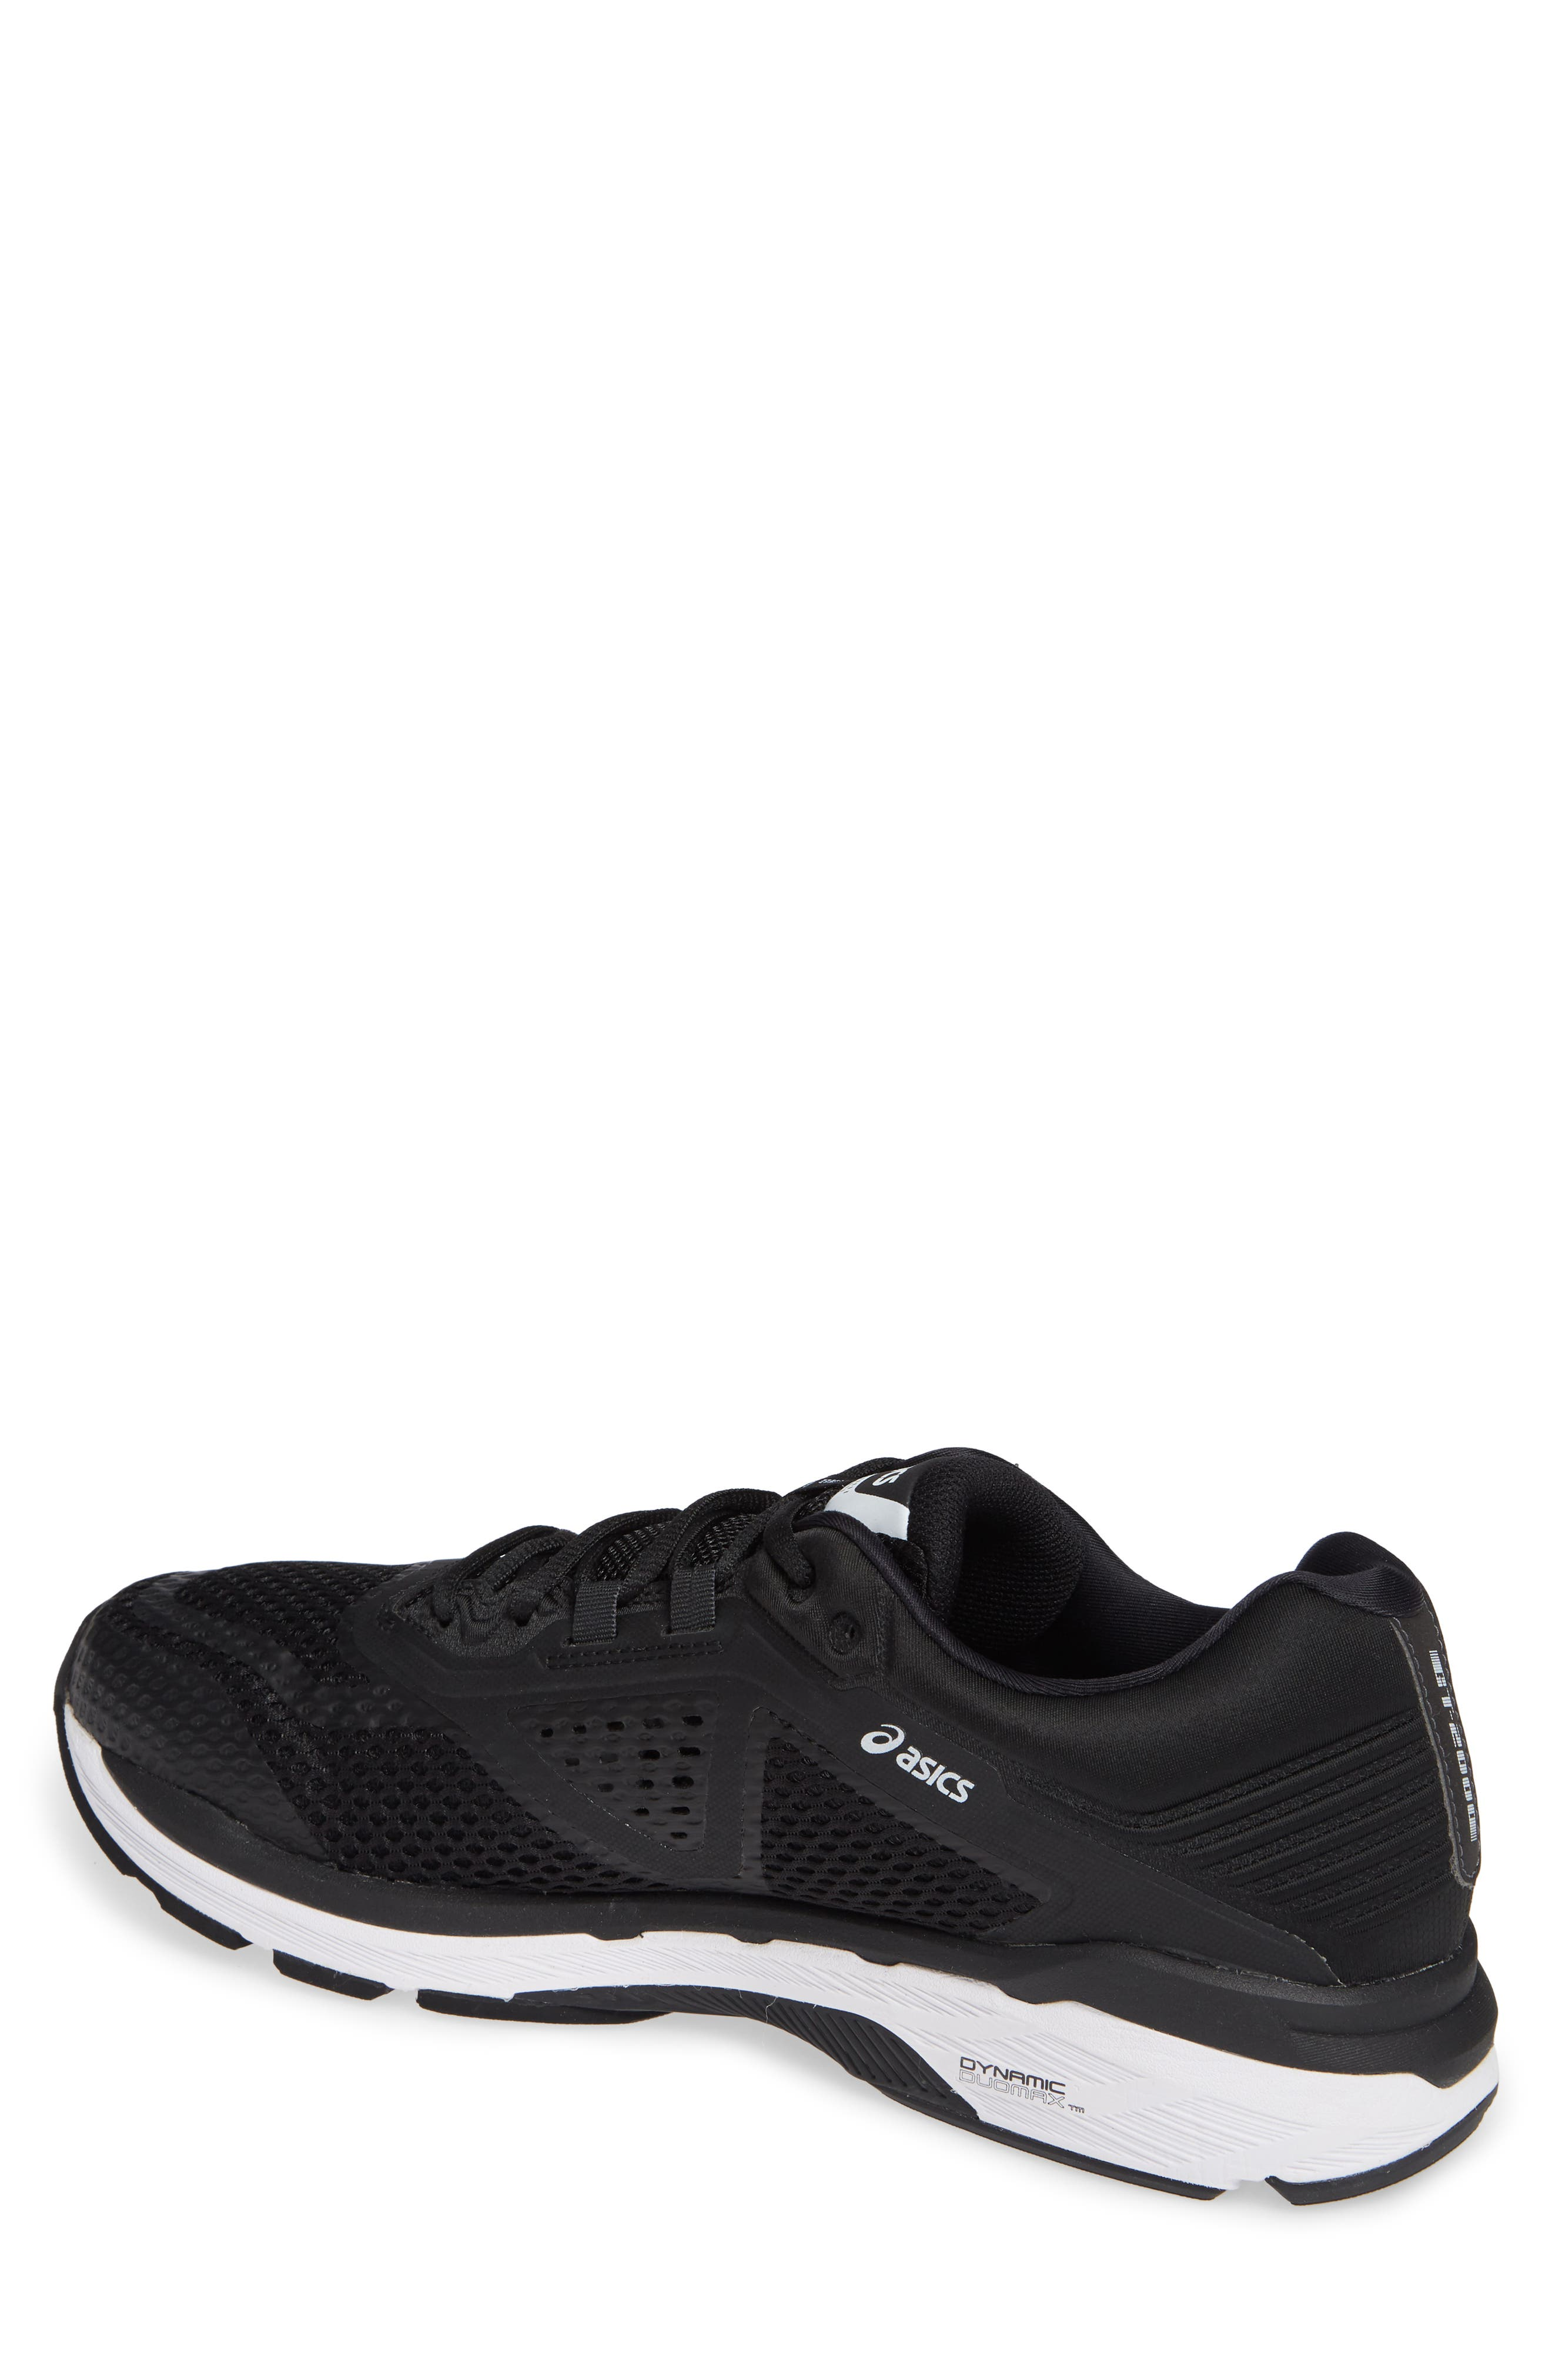 GT-2000 6 Running Shoe,                             Alternate thumbnail 2, color,                             001